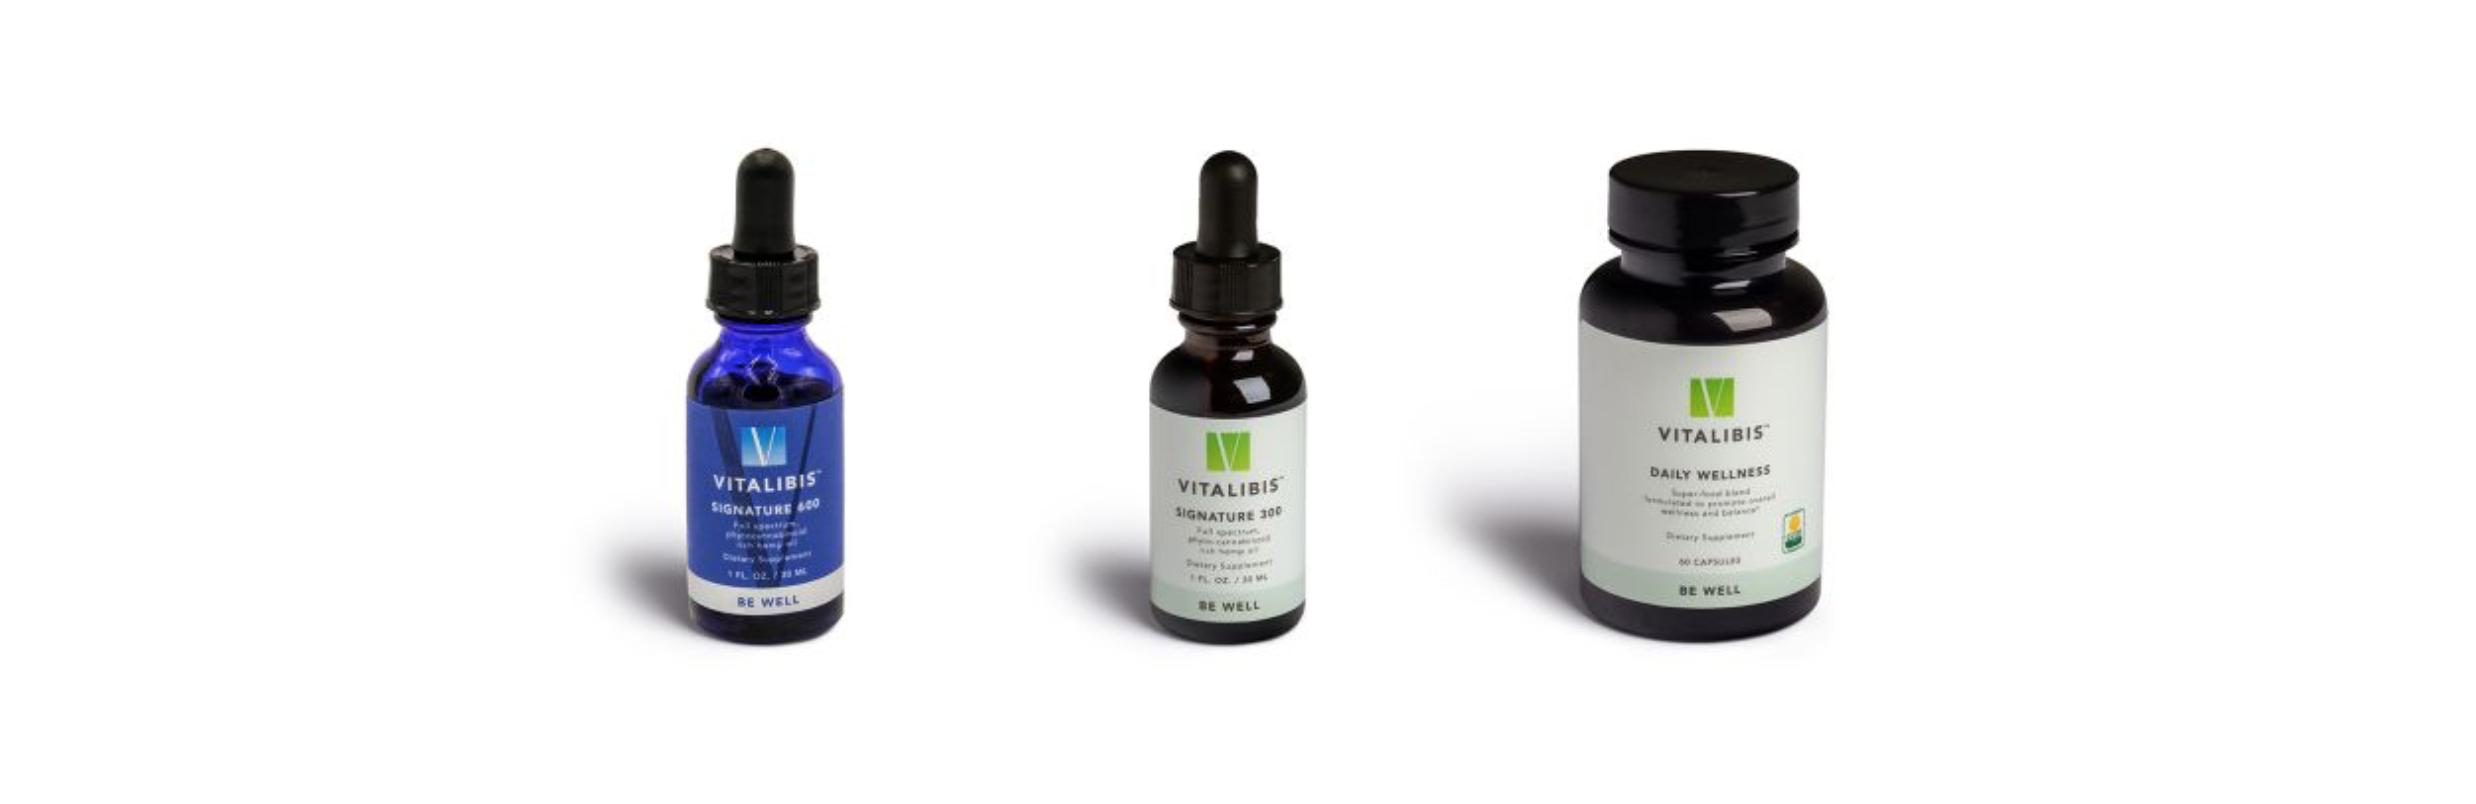 Vitaliblis Products